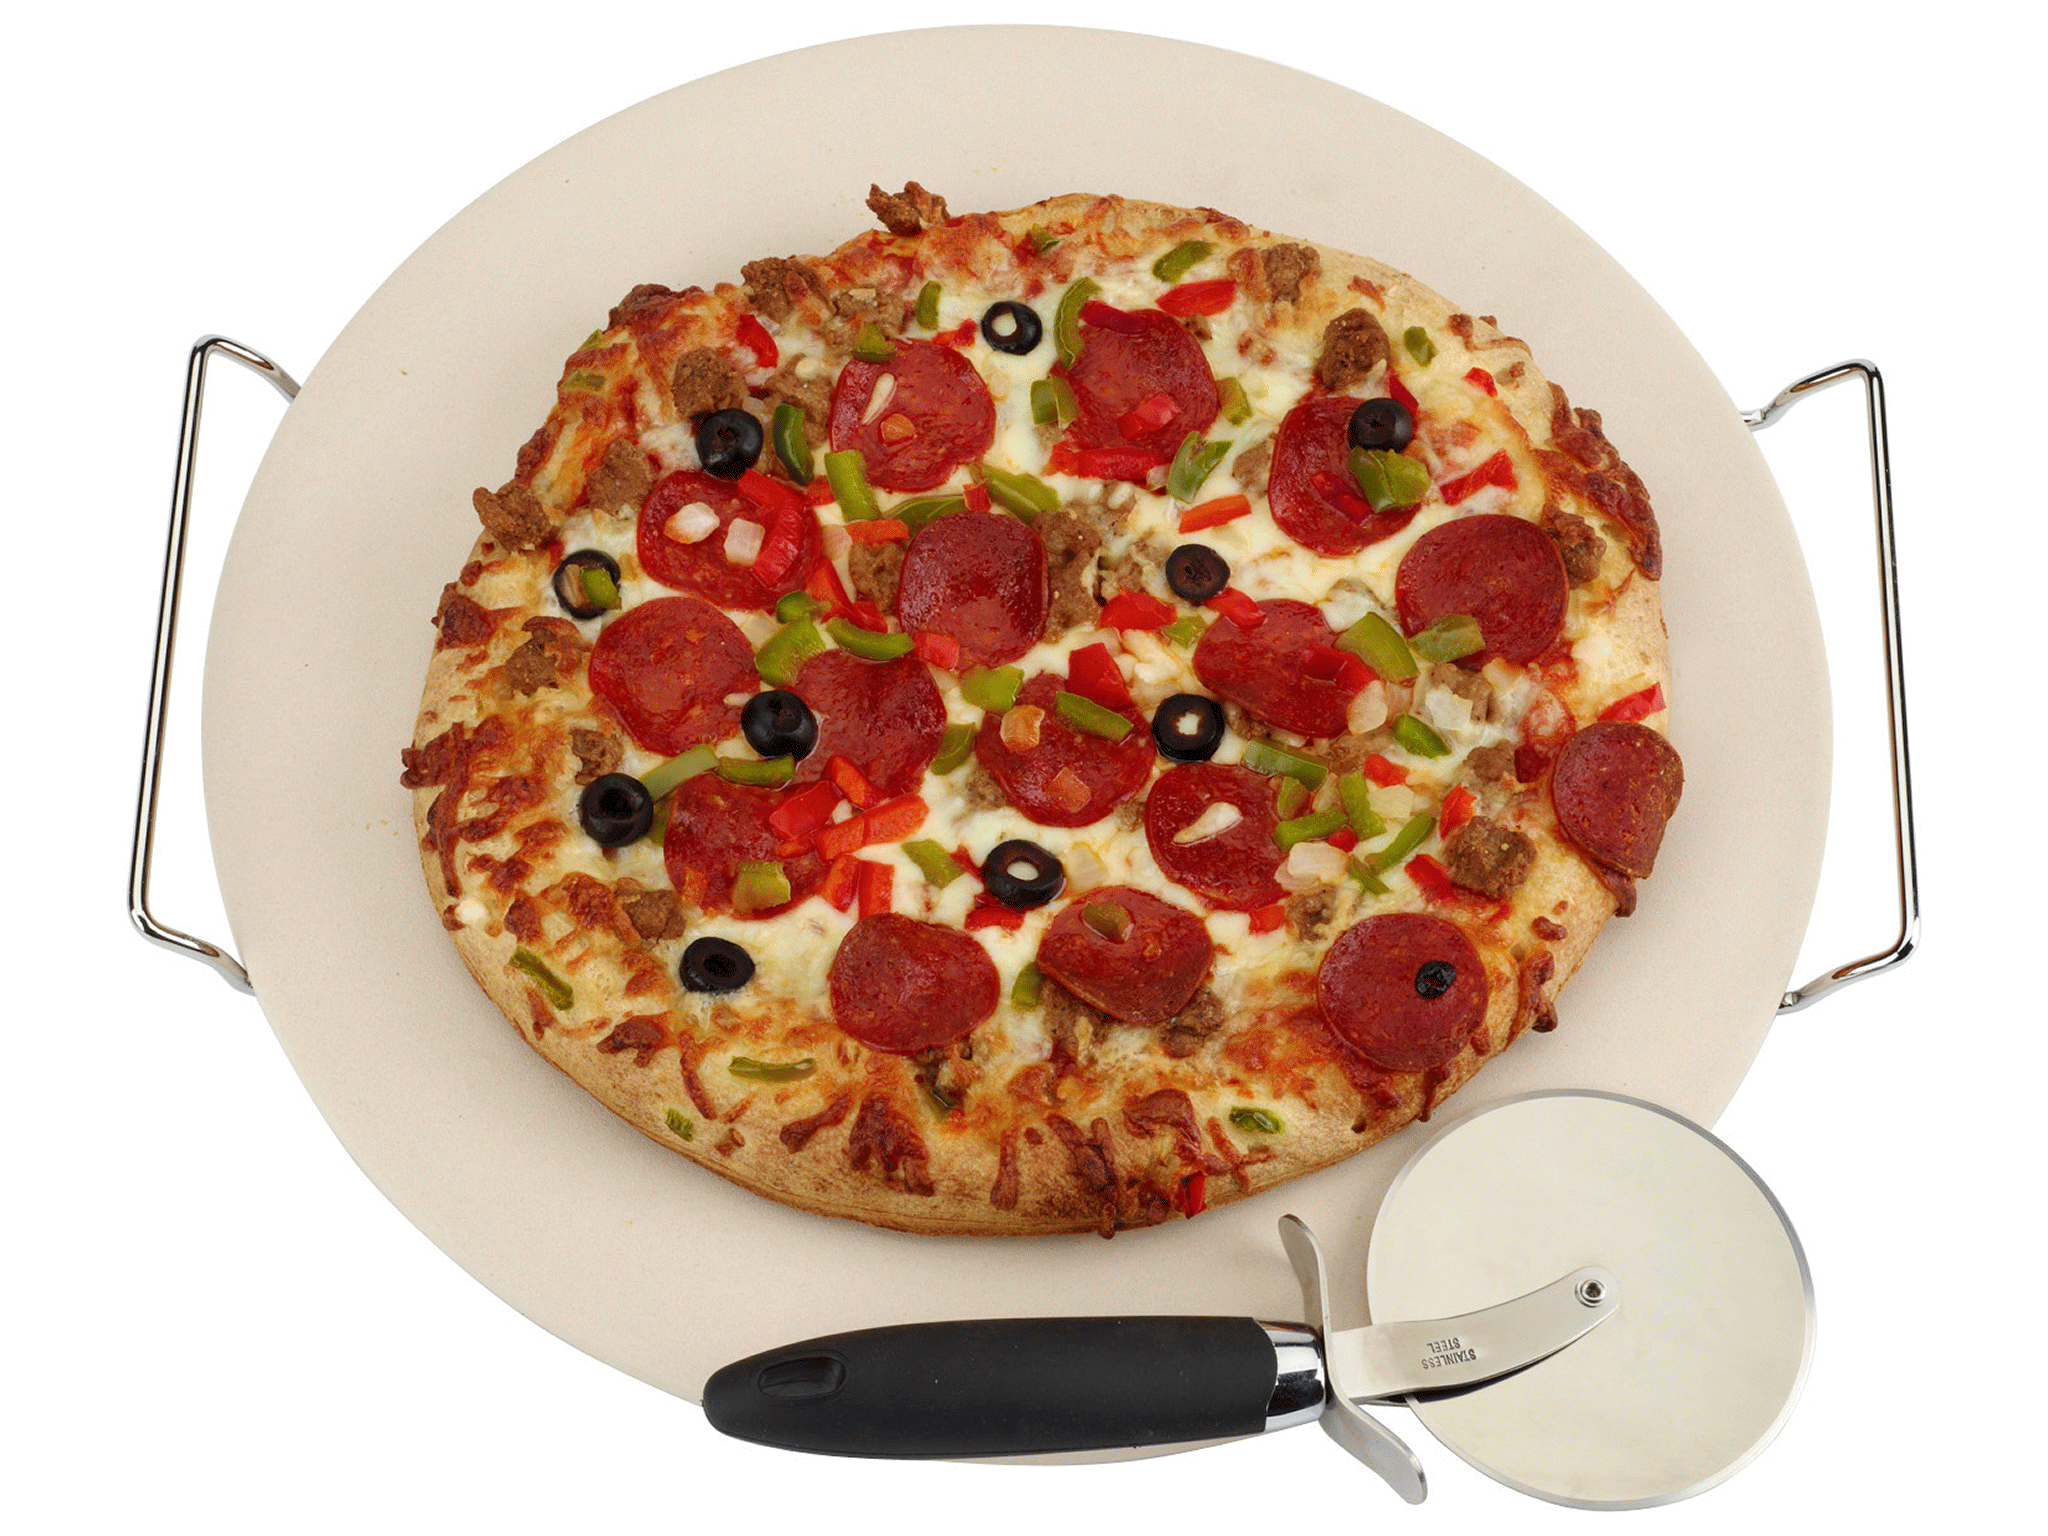 California Pizza Kitchen Chicken Tequila Fettuccine Grand Gourmet 15 Round Pizza Stone With Rack  Meijer